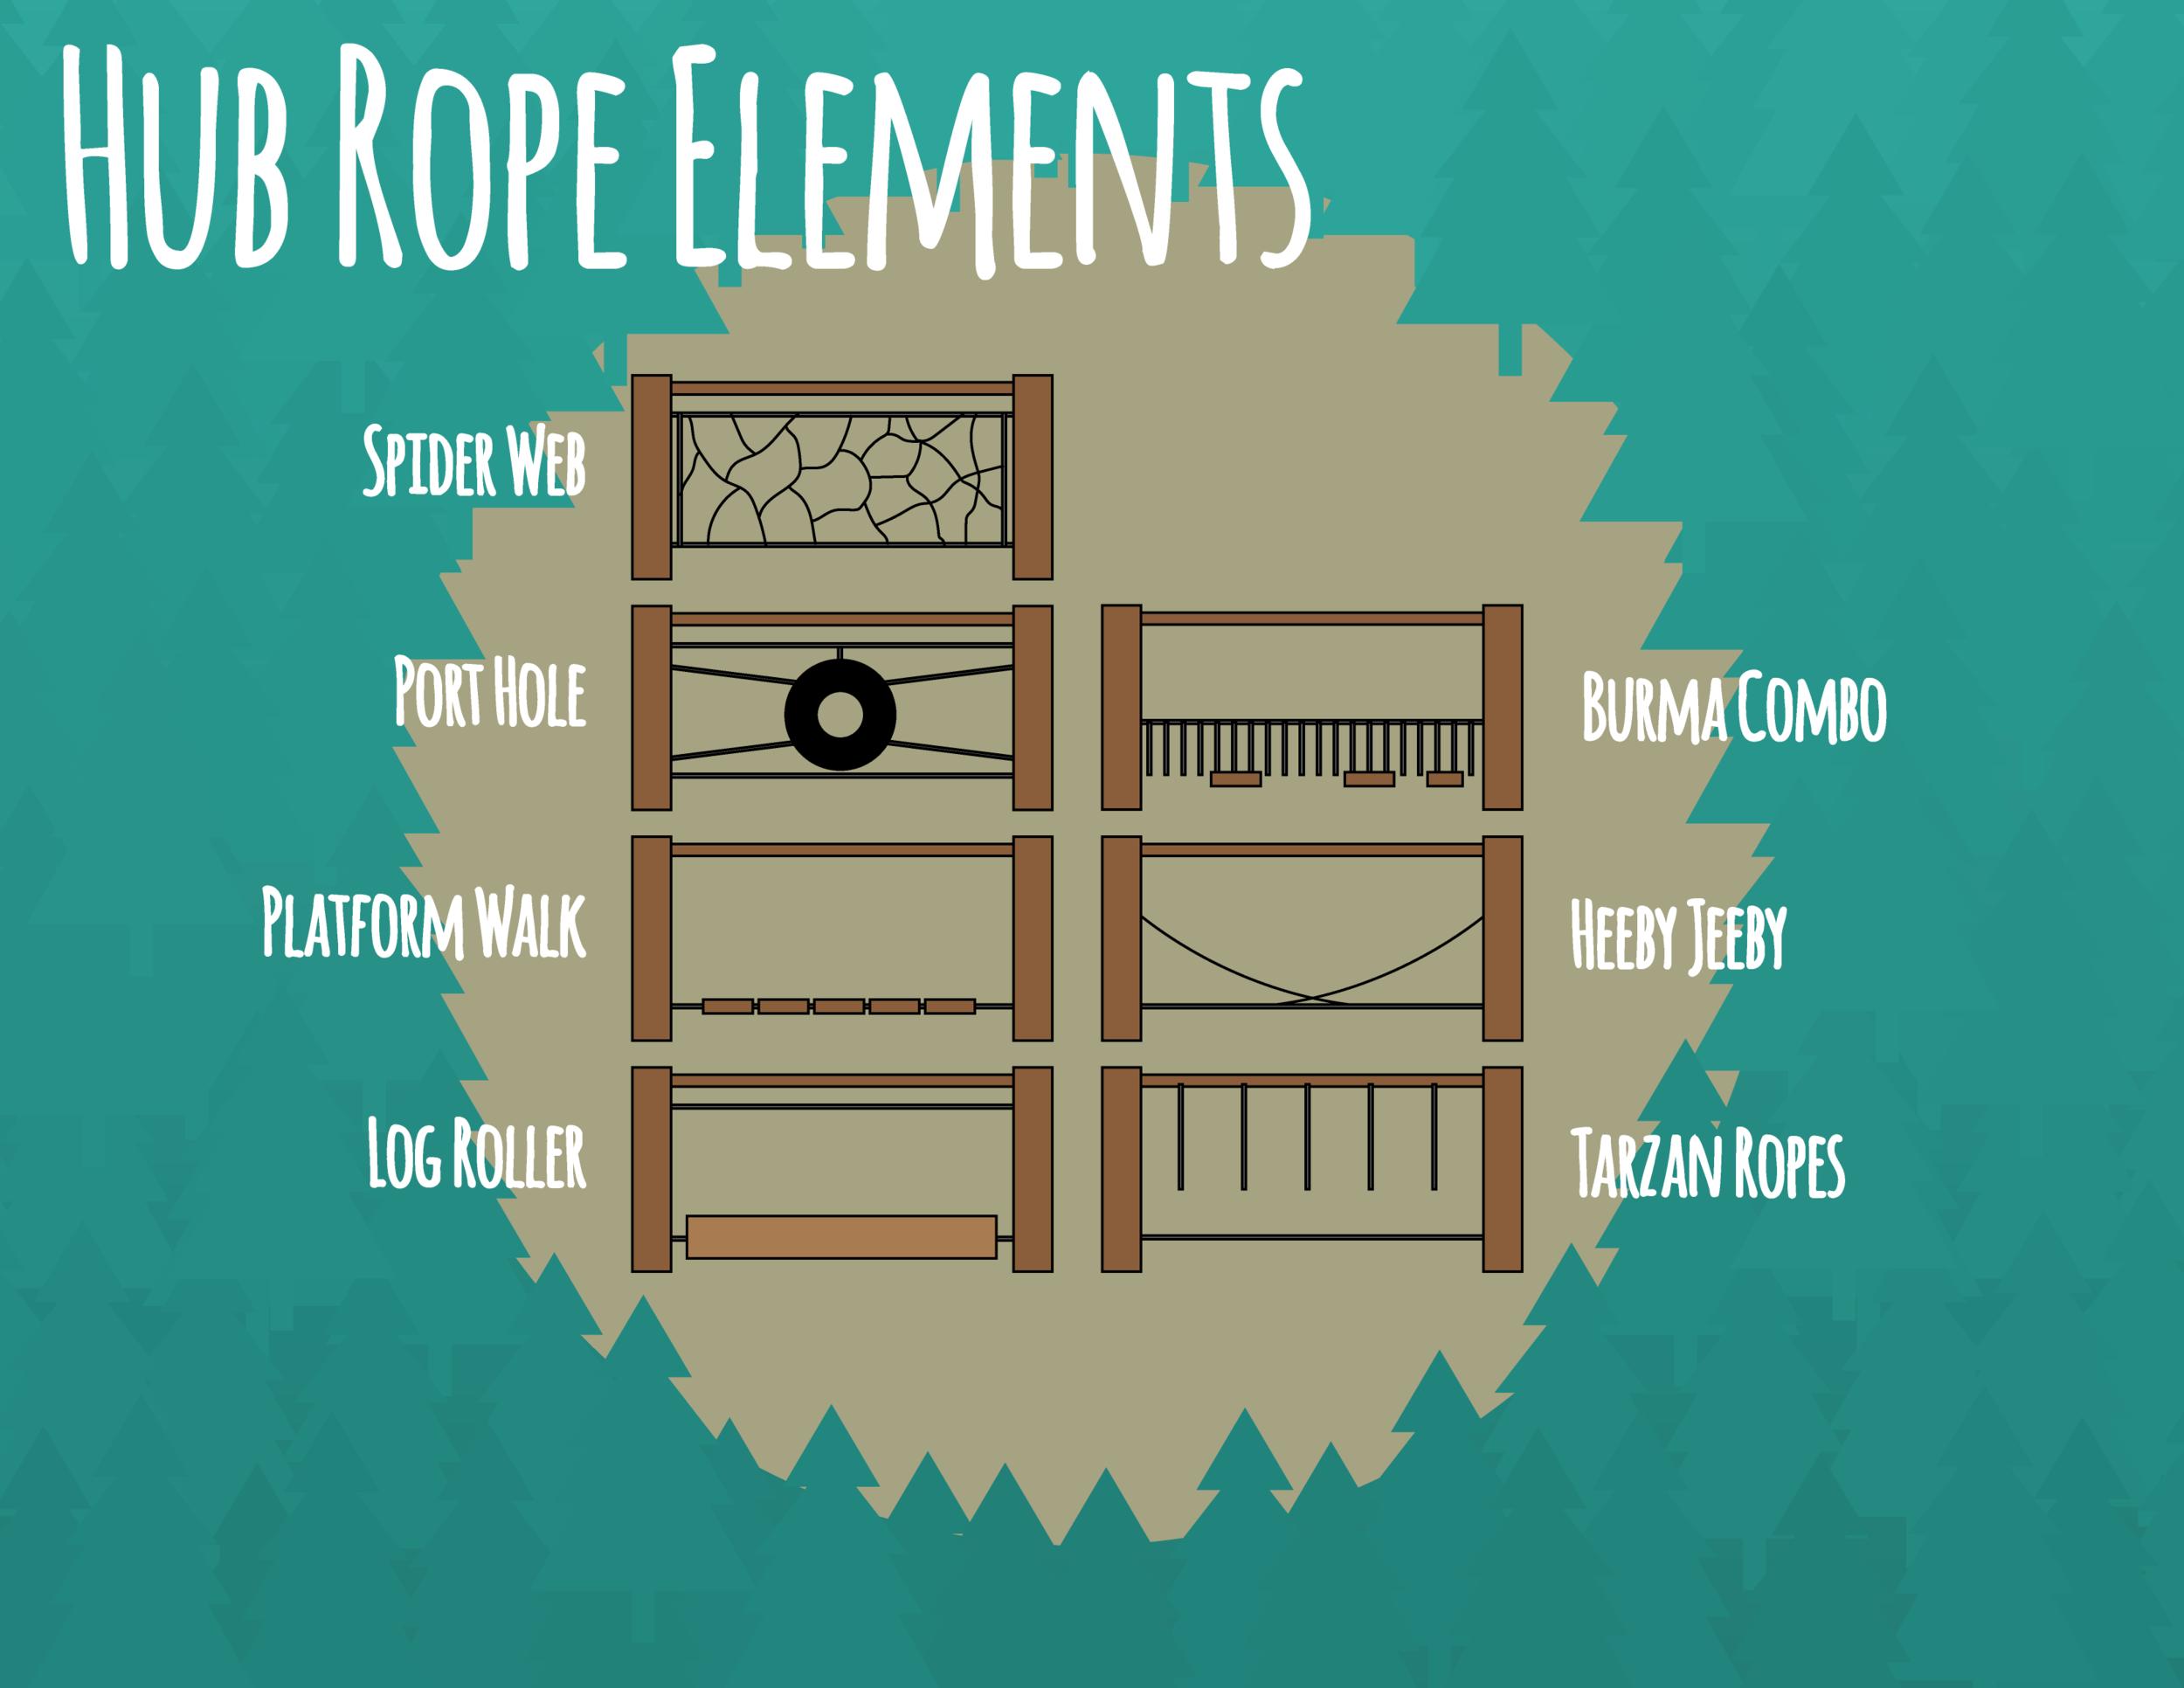 Hub Rope Elements Camp Kadesh